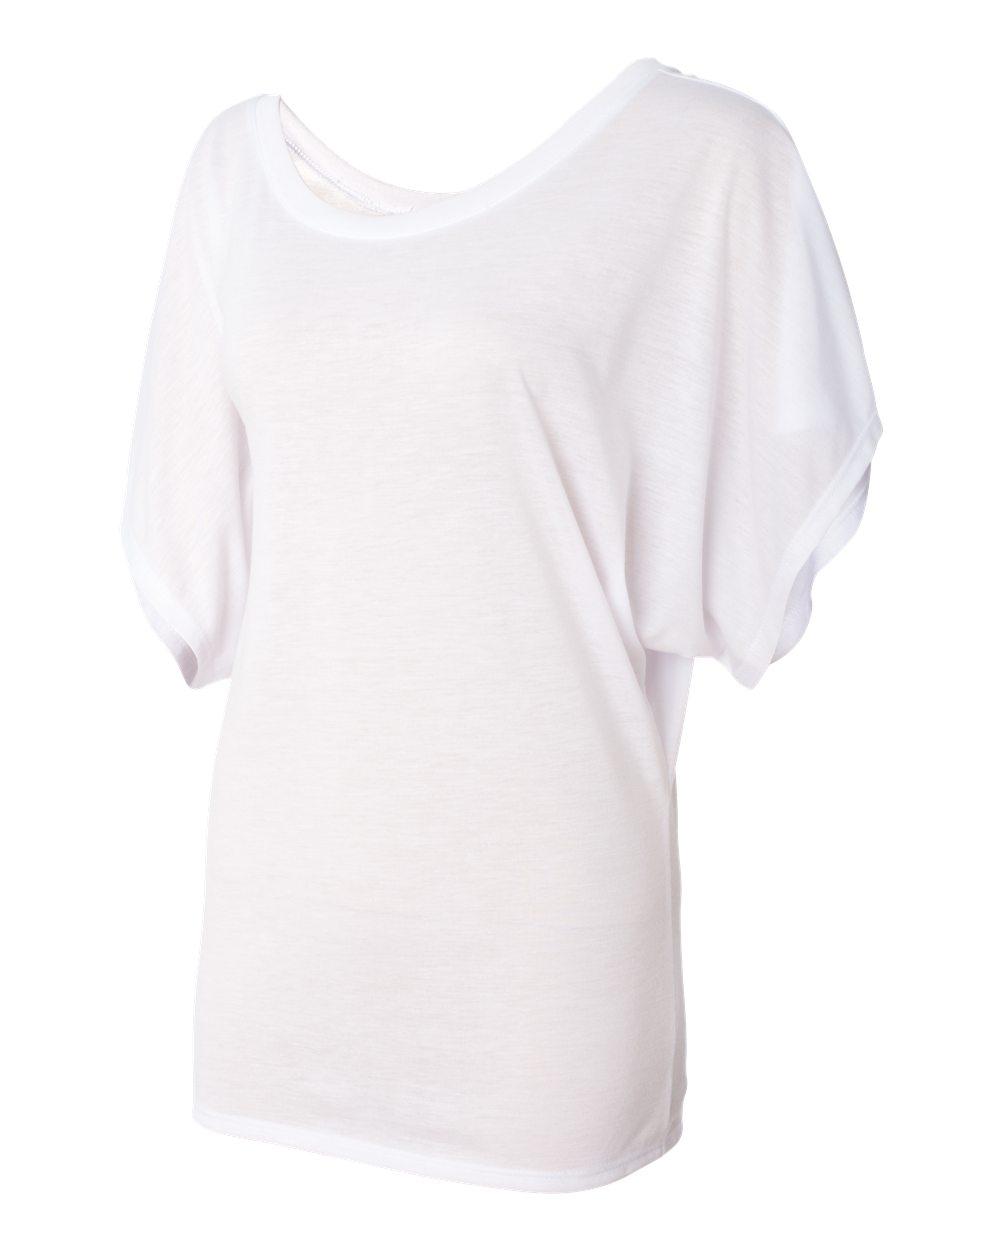 Bella-Canvas-Women-039-s-Flowy-Draped-Sleeve-Dolman-T-Shirt-8821-S-2XL thumbnail 30